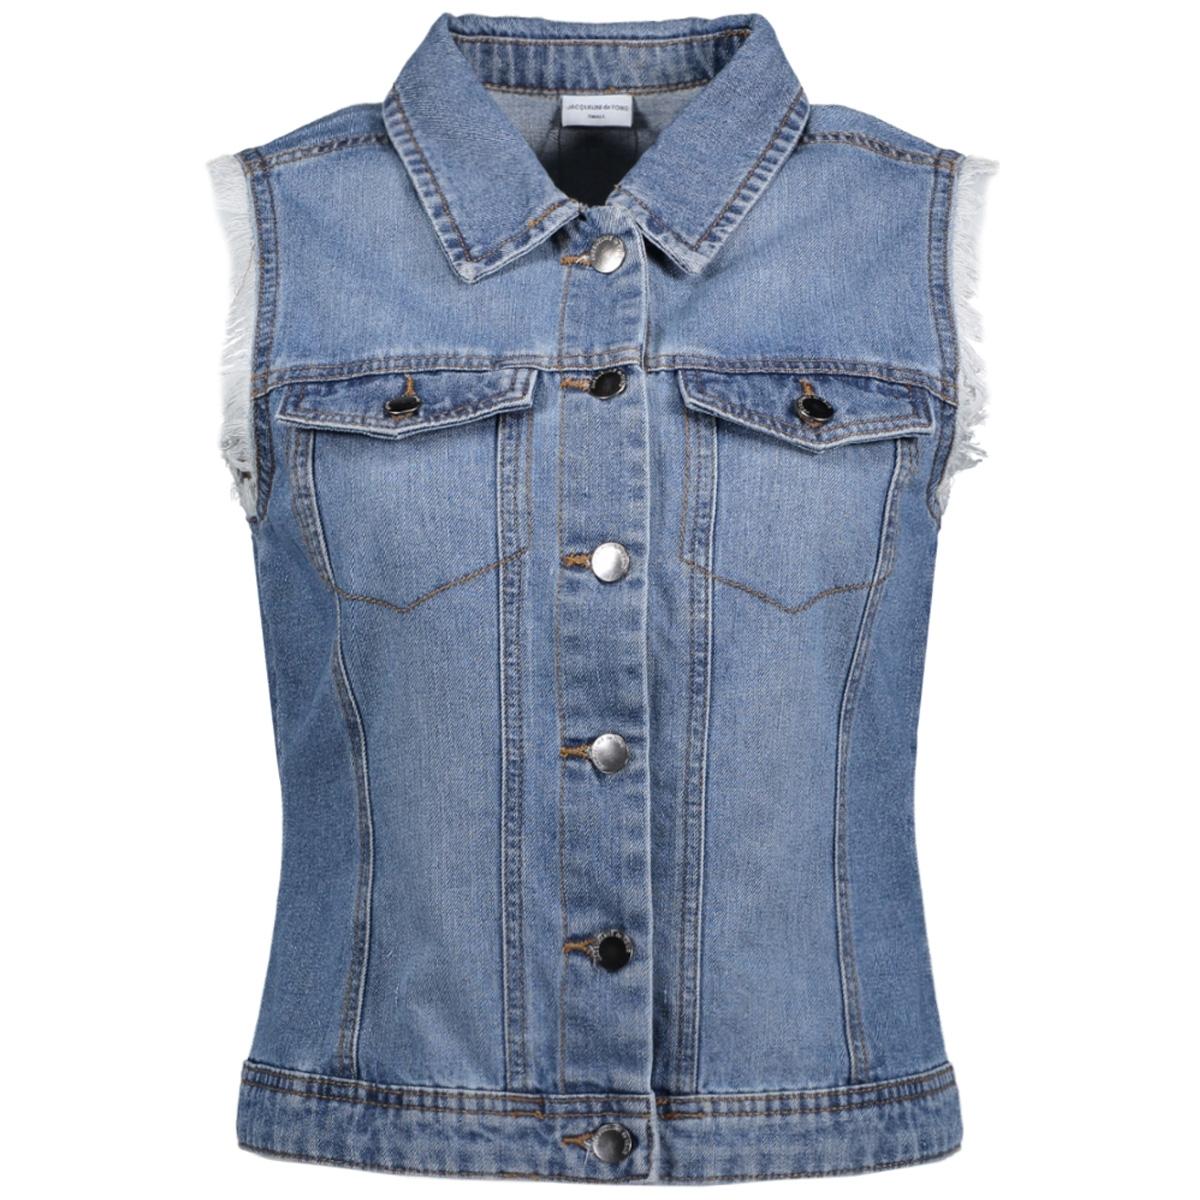 jdyashley denim waistcoat dnm 15133206 jacqueline de yong gilet light blue denim